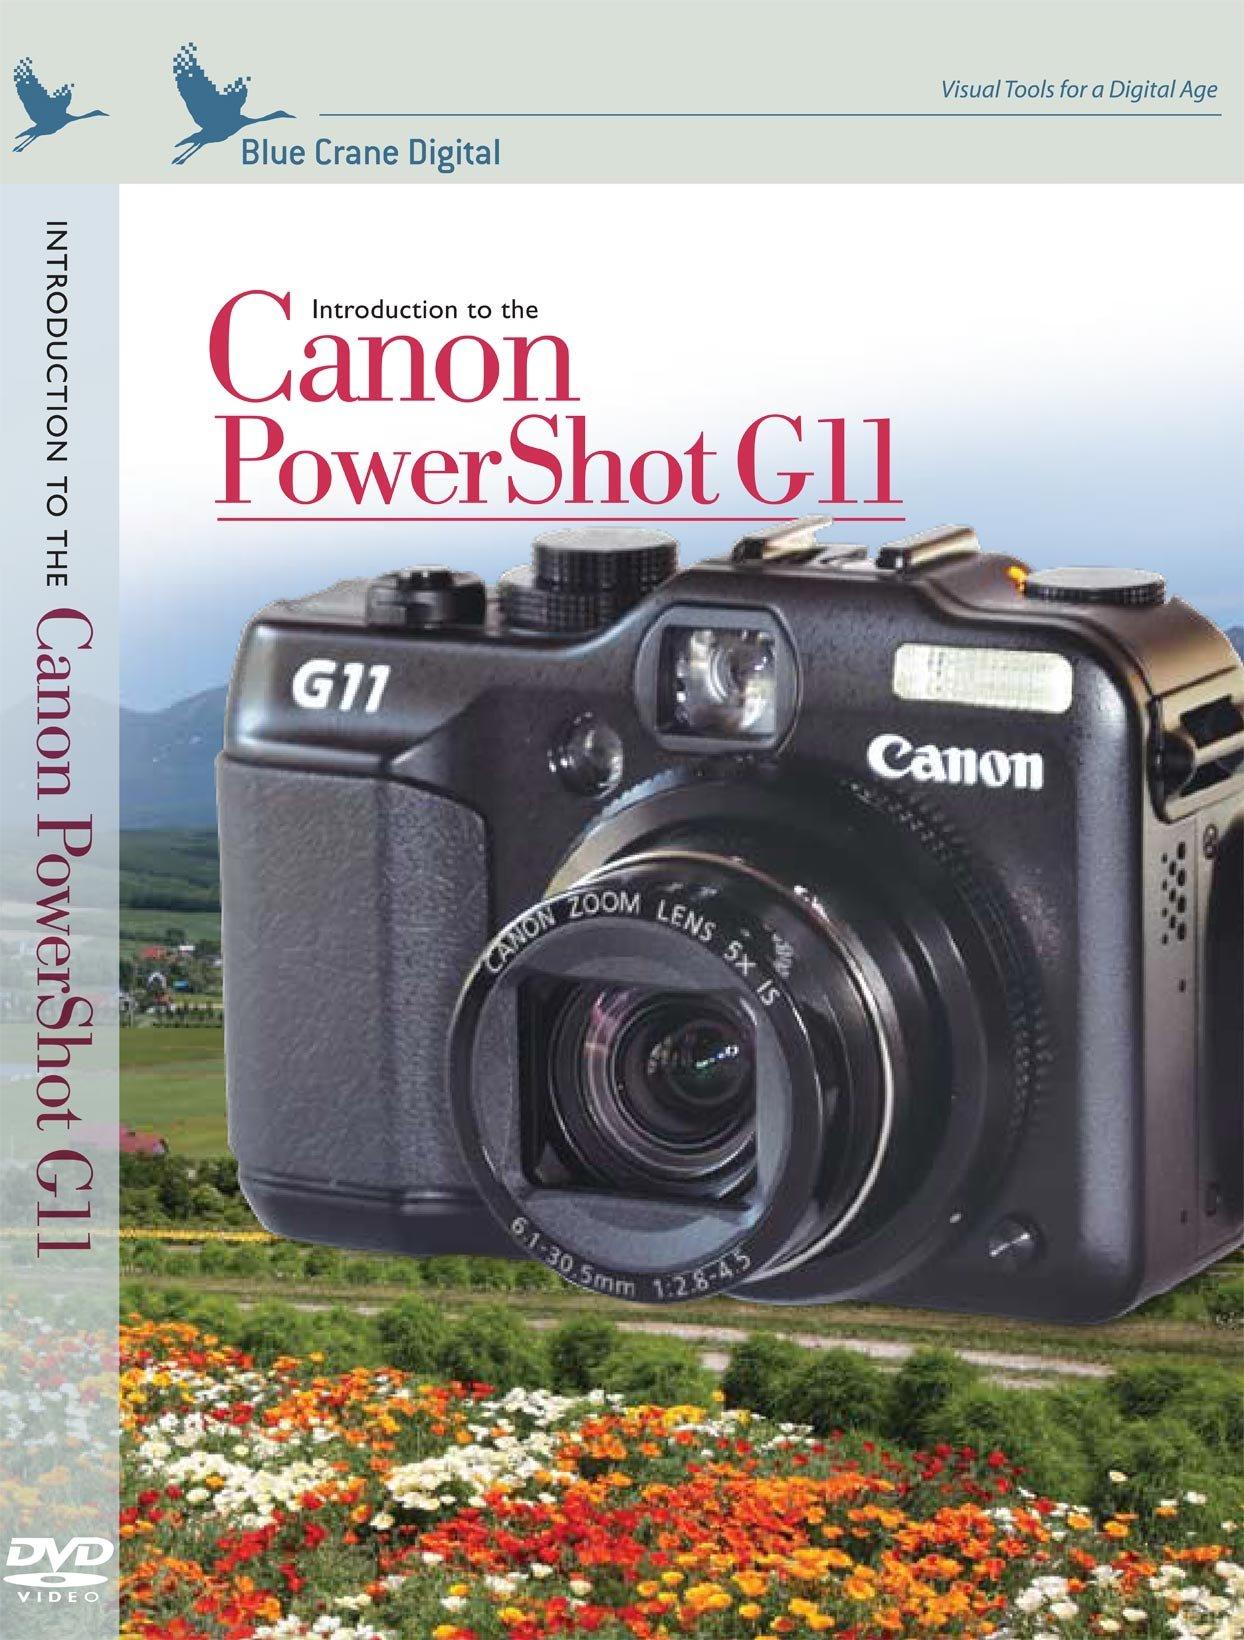 Blue Crane Digital Training DVD for Canon PowerShot G11 (zBC132)